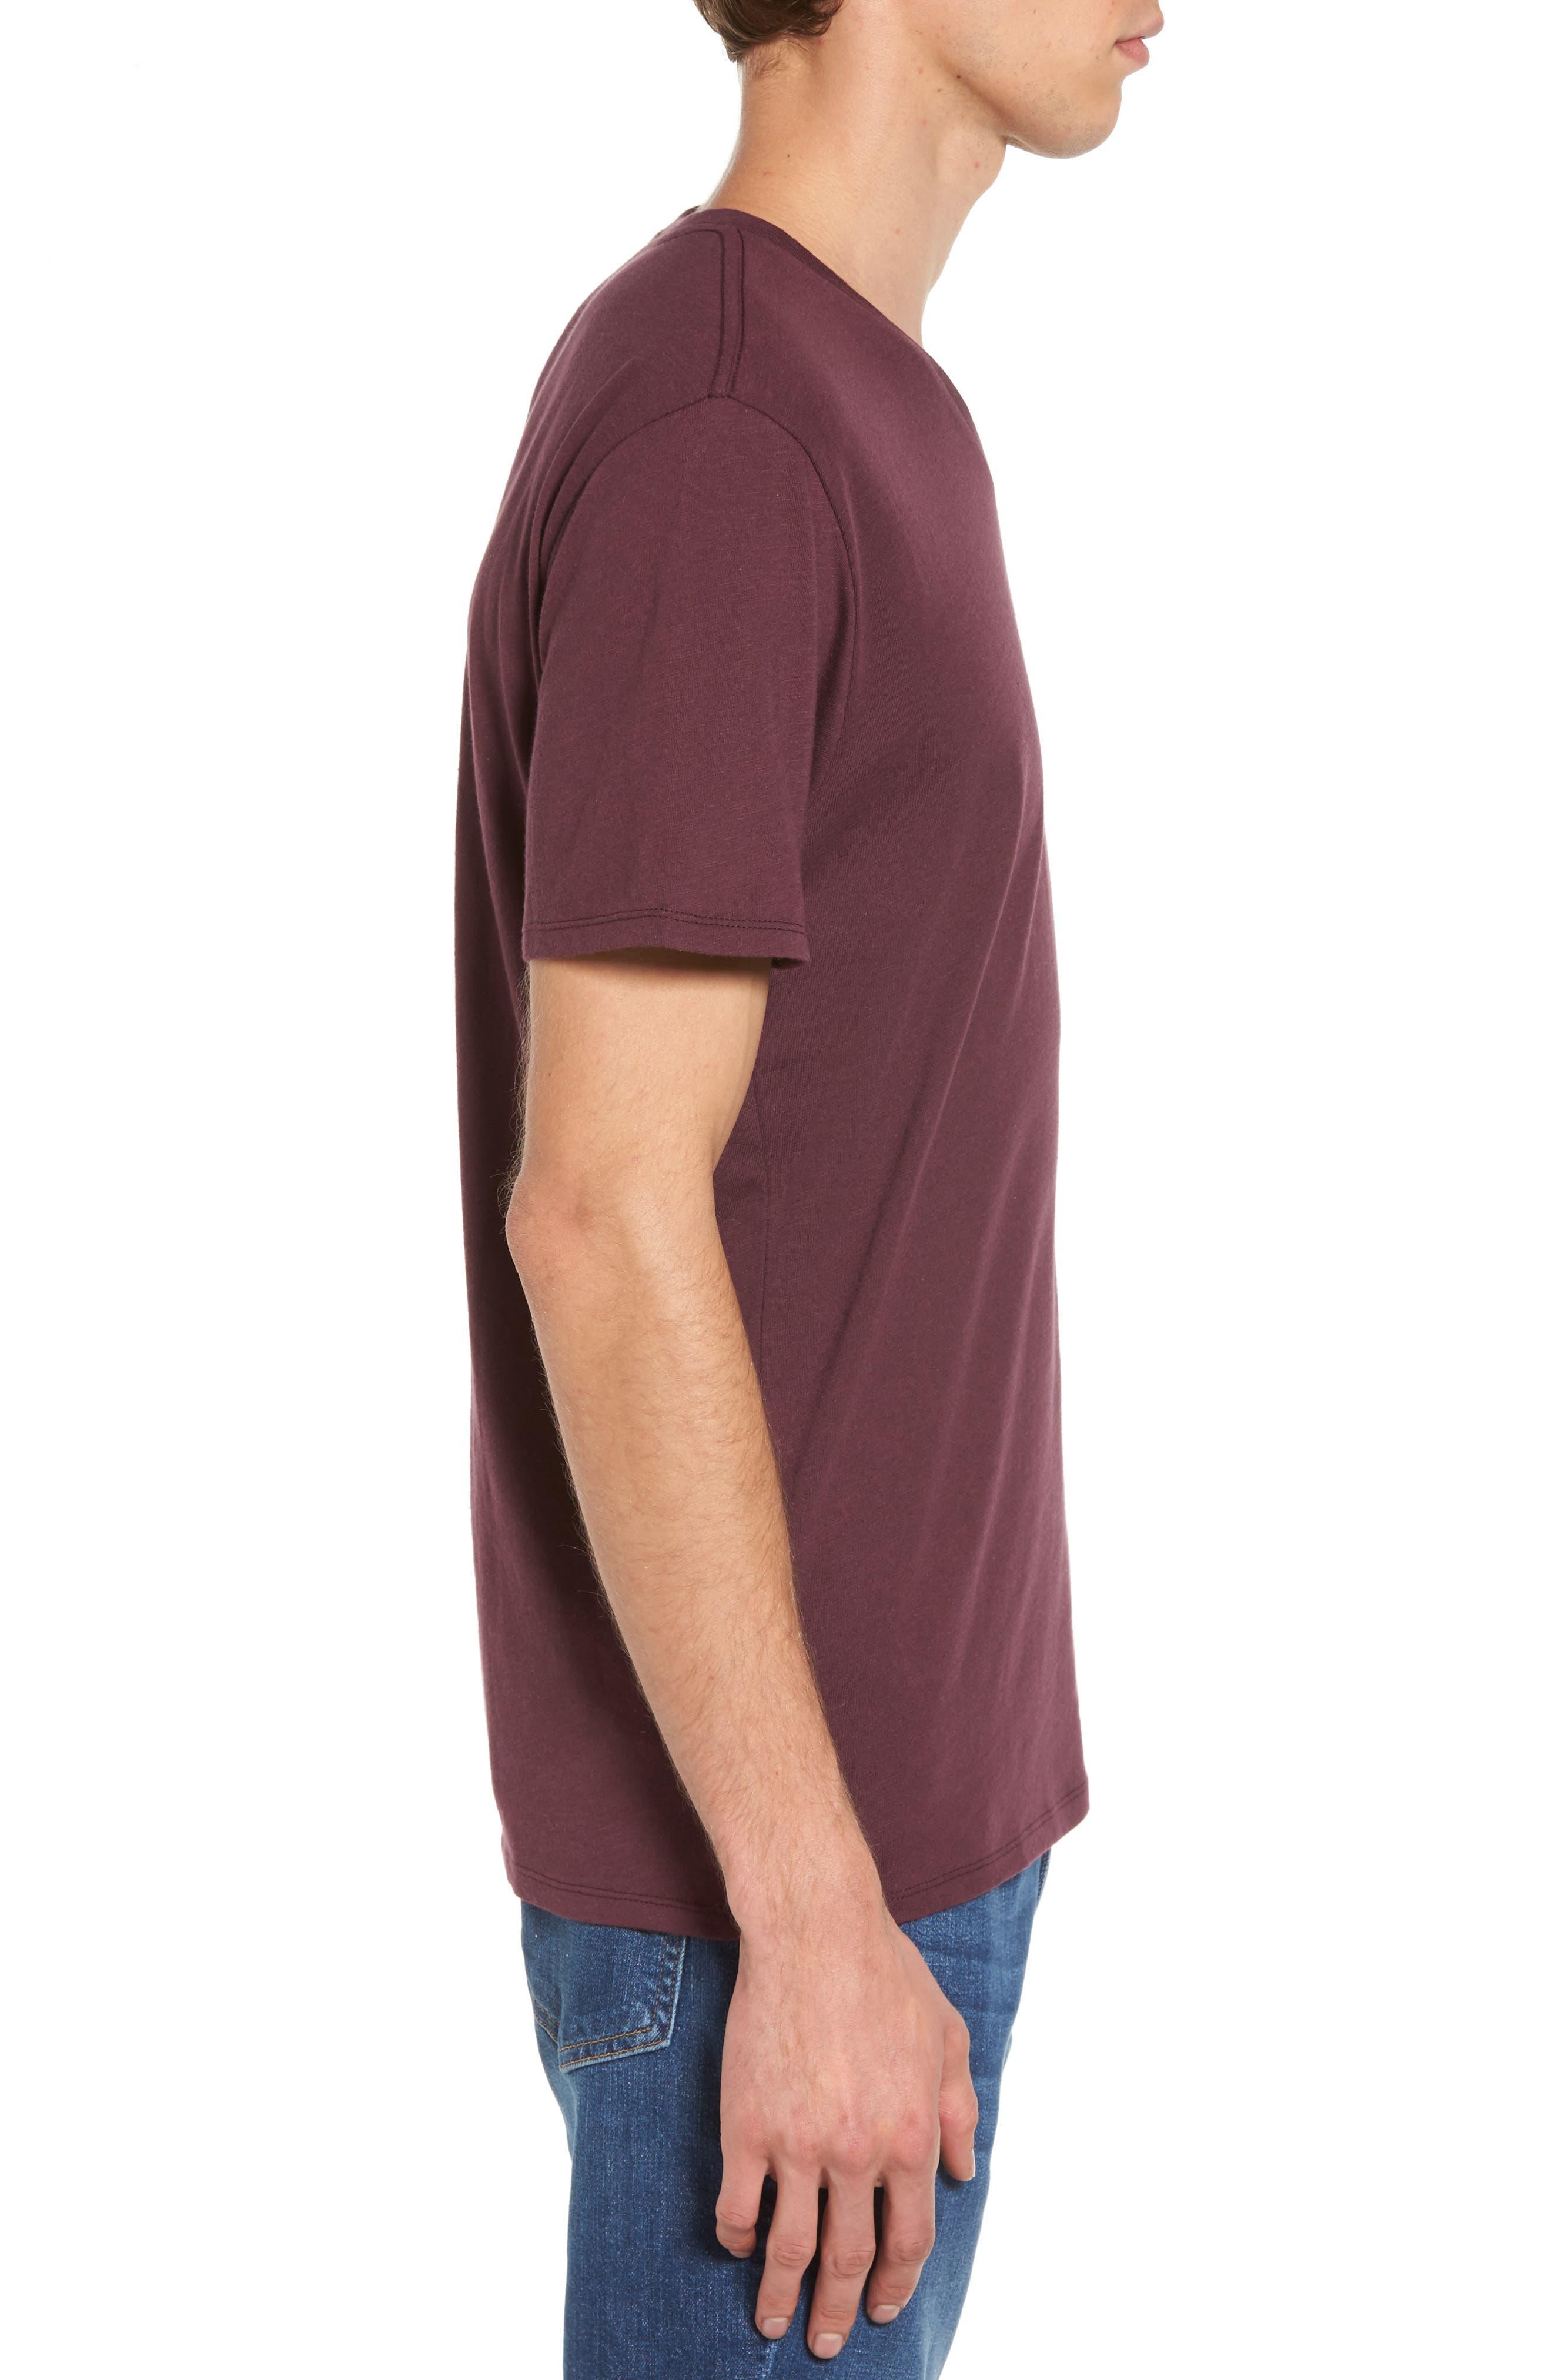 Alternate Image 3  - The Rail Slub Cotton V-Neck T-Shirt (2 for $30)